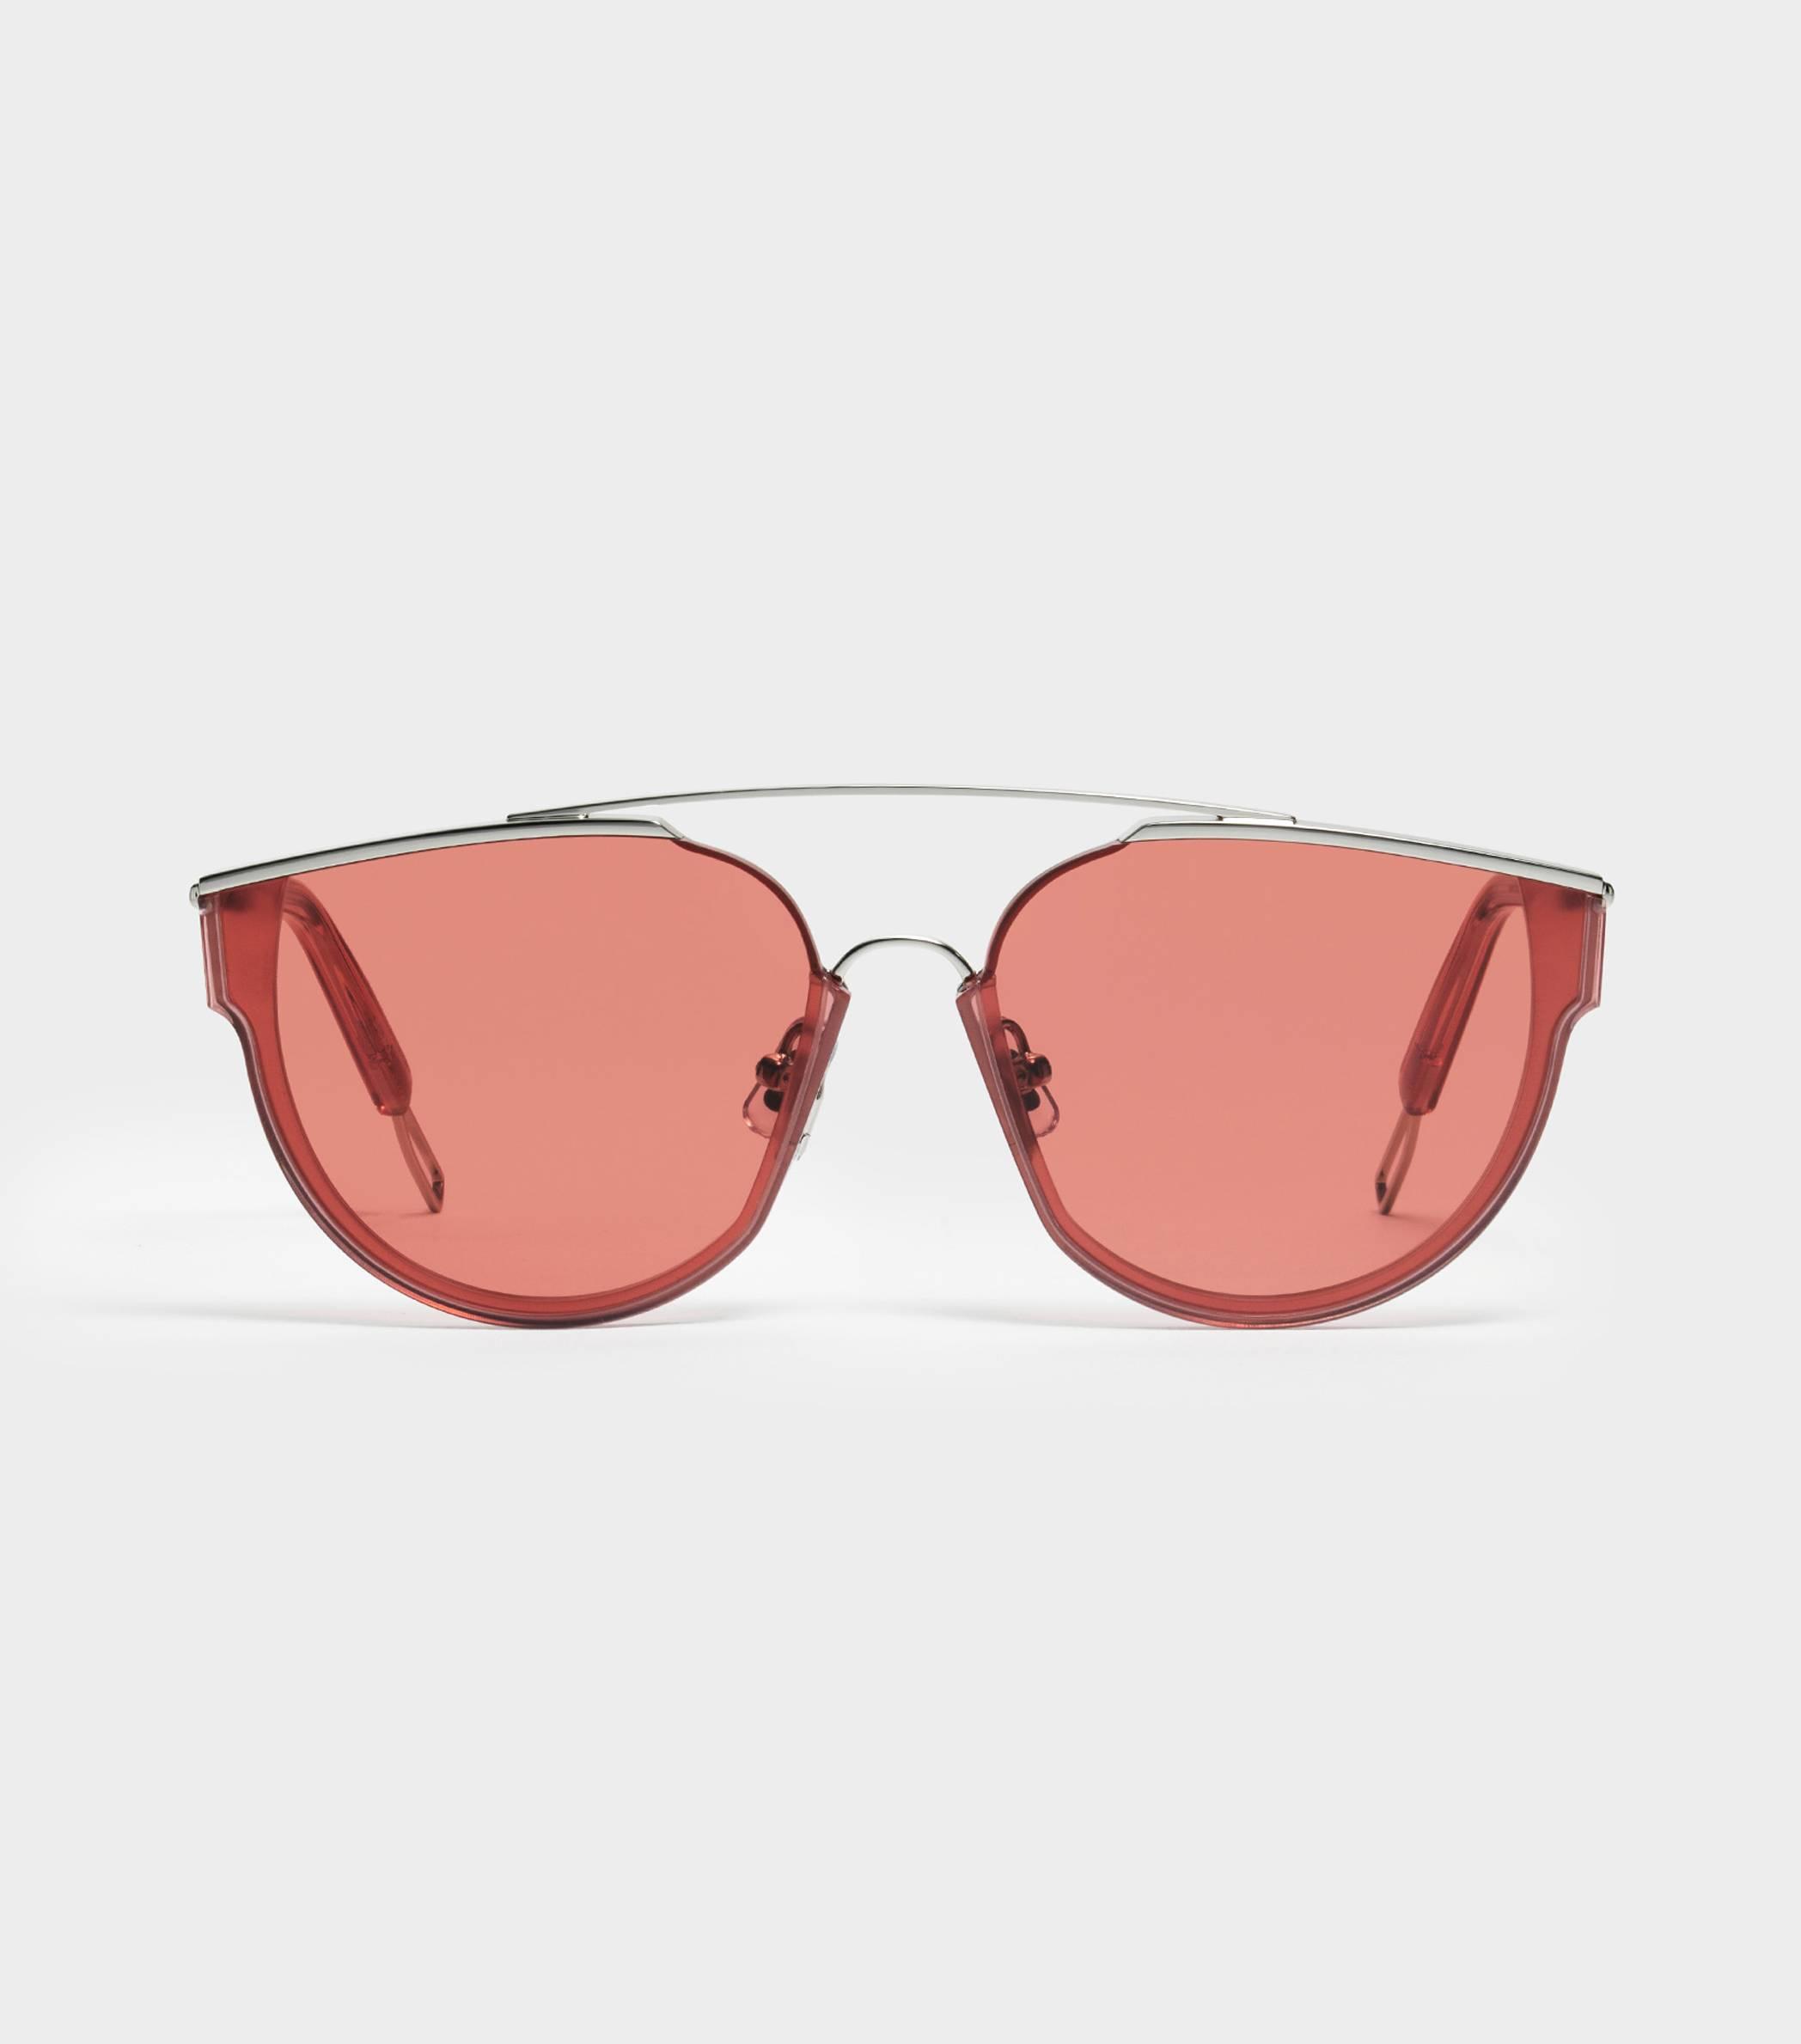 GENTLE MONSTER Sunglasses.